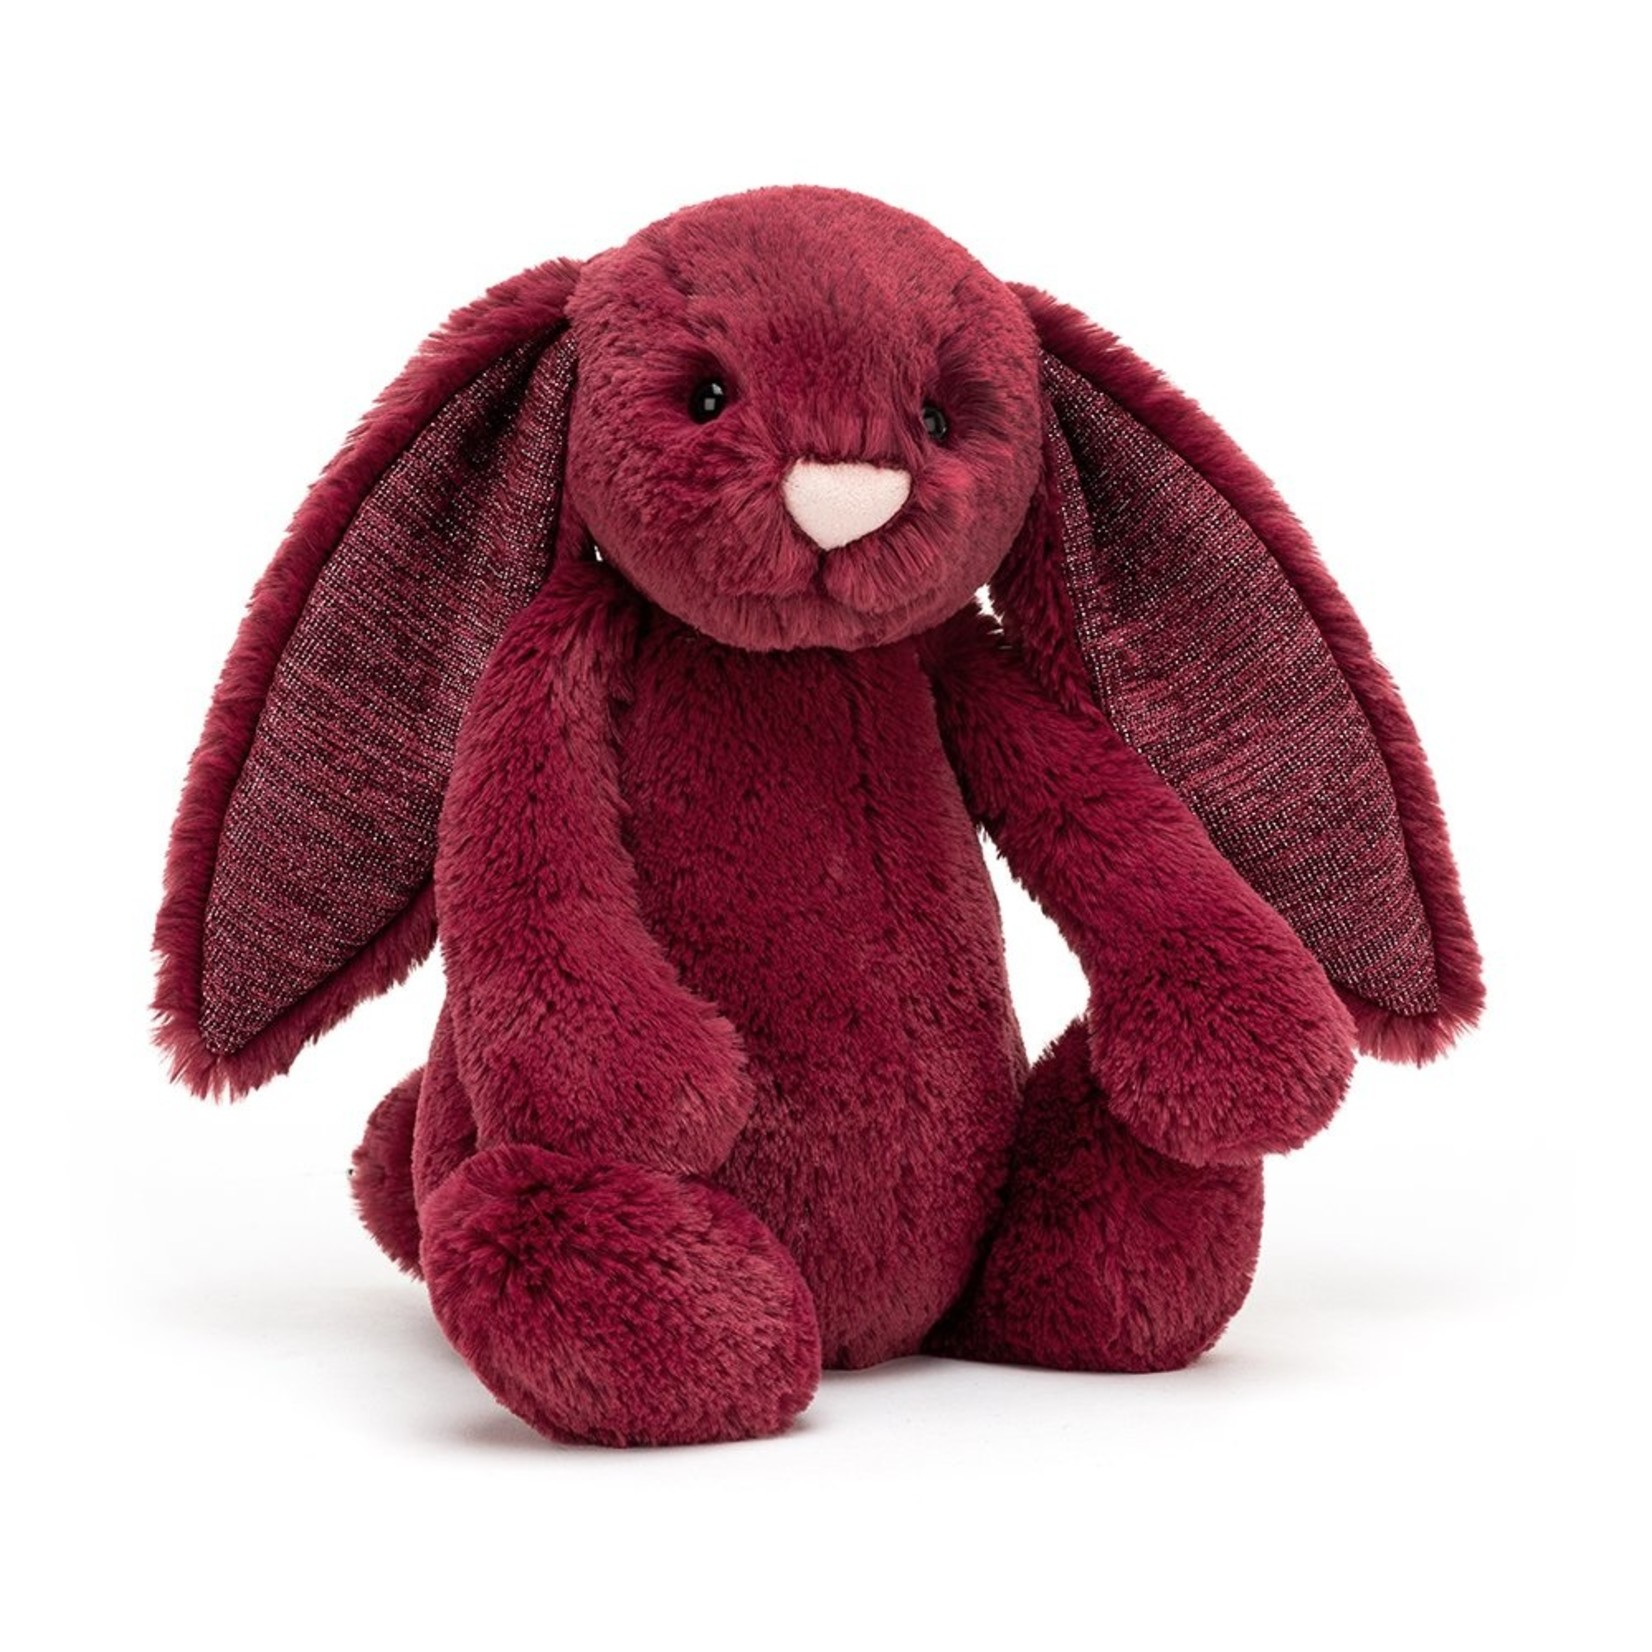 Jellycat Bashful Sparkly Cassis Bunny Medium